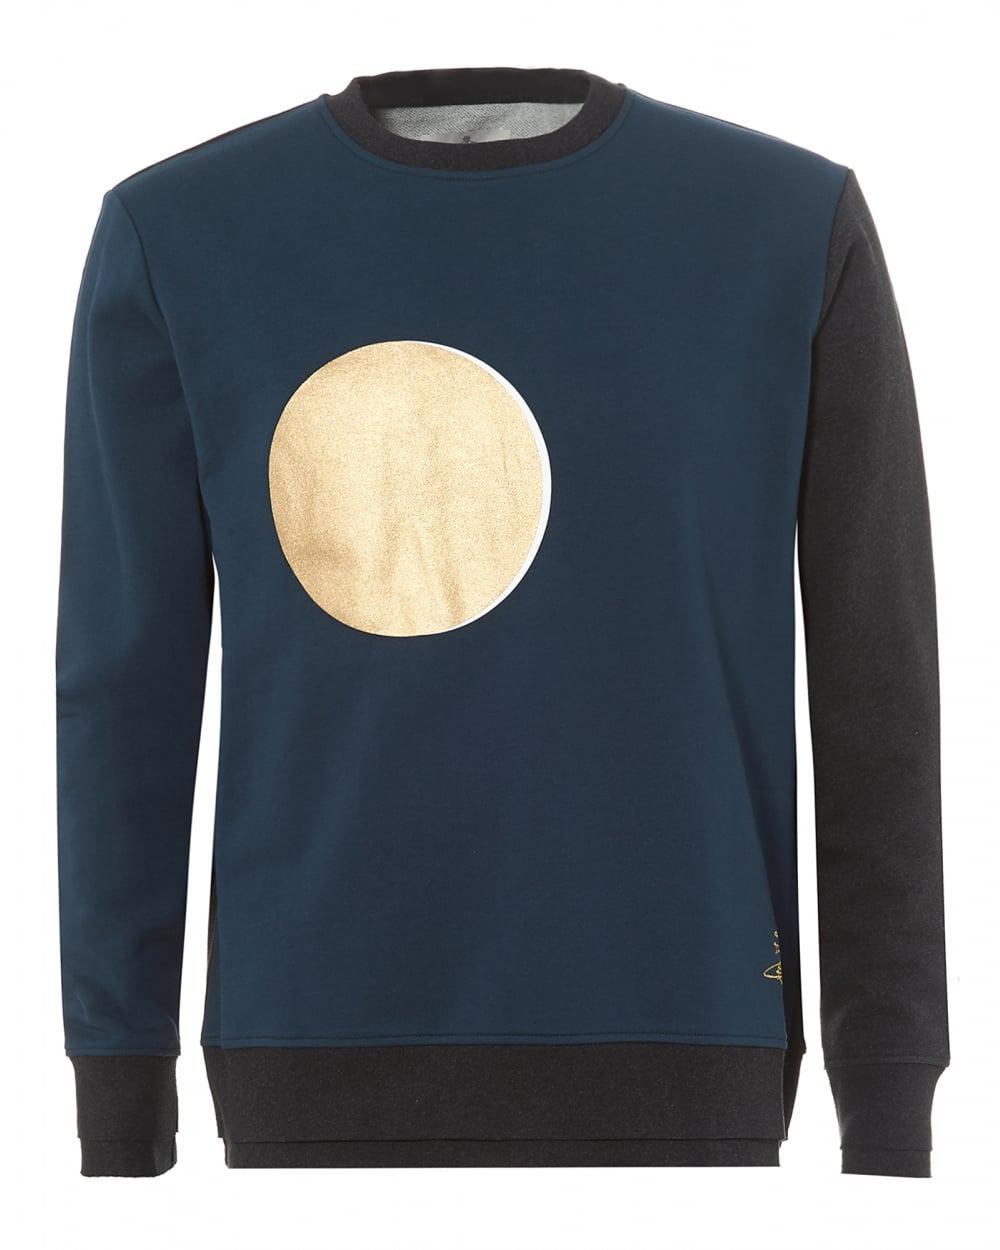 Vivienne Westwood Mens Sweatshirt, Blue Black Eclipse Print Sweater